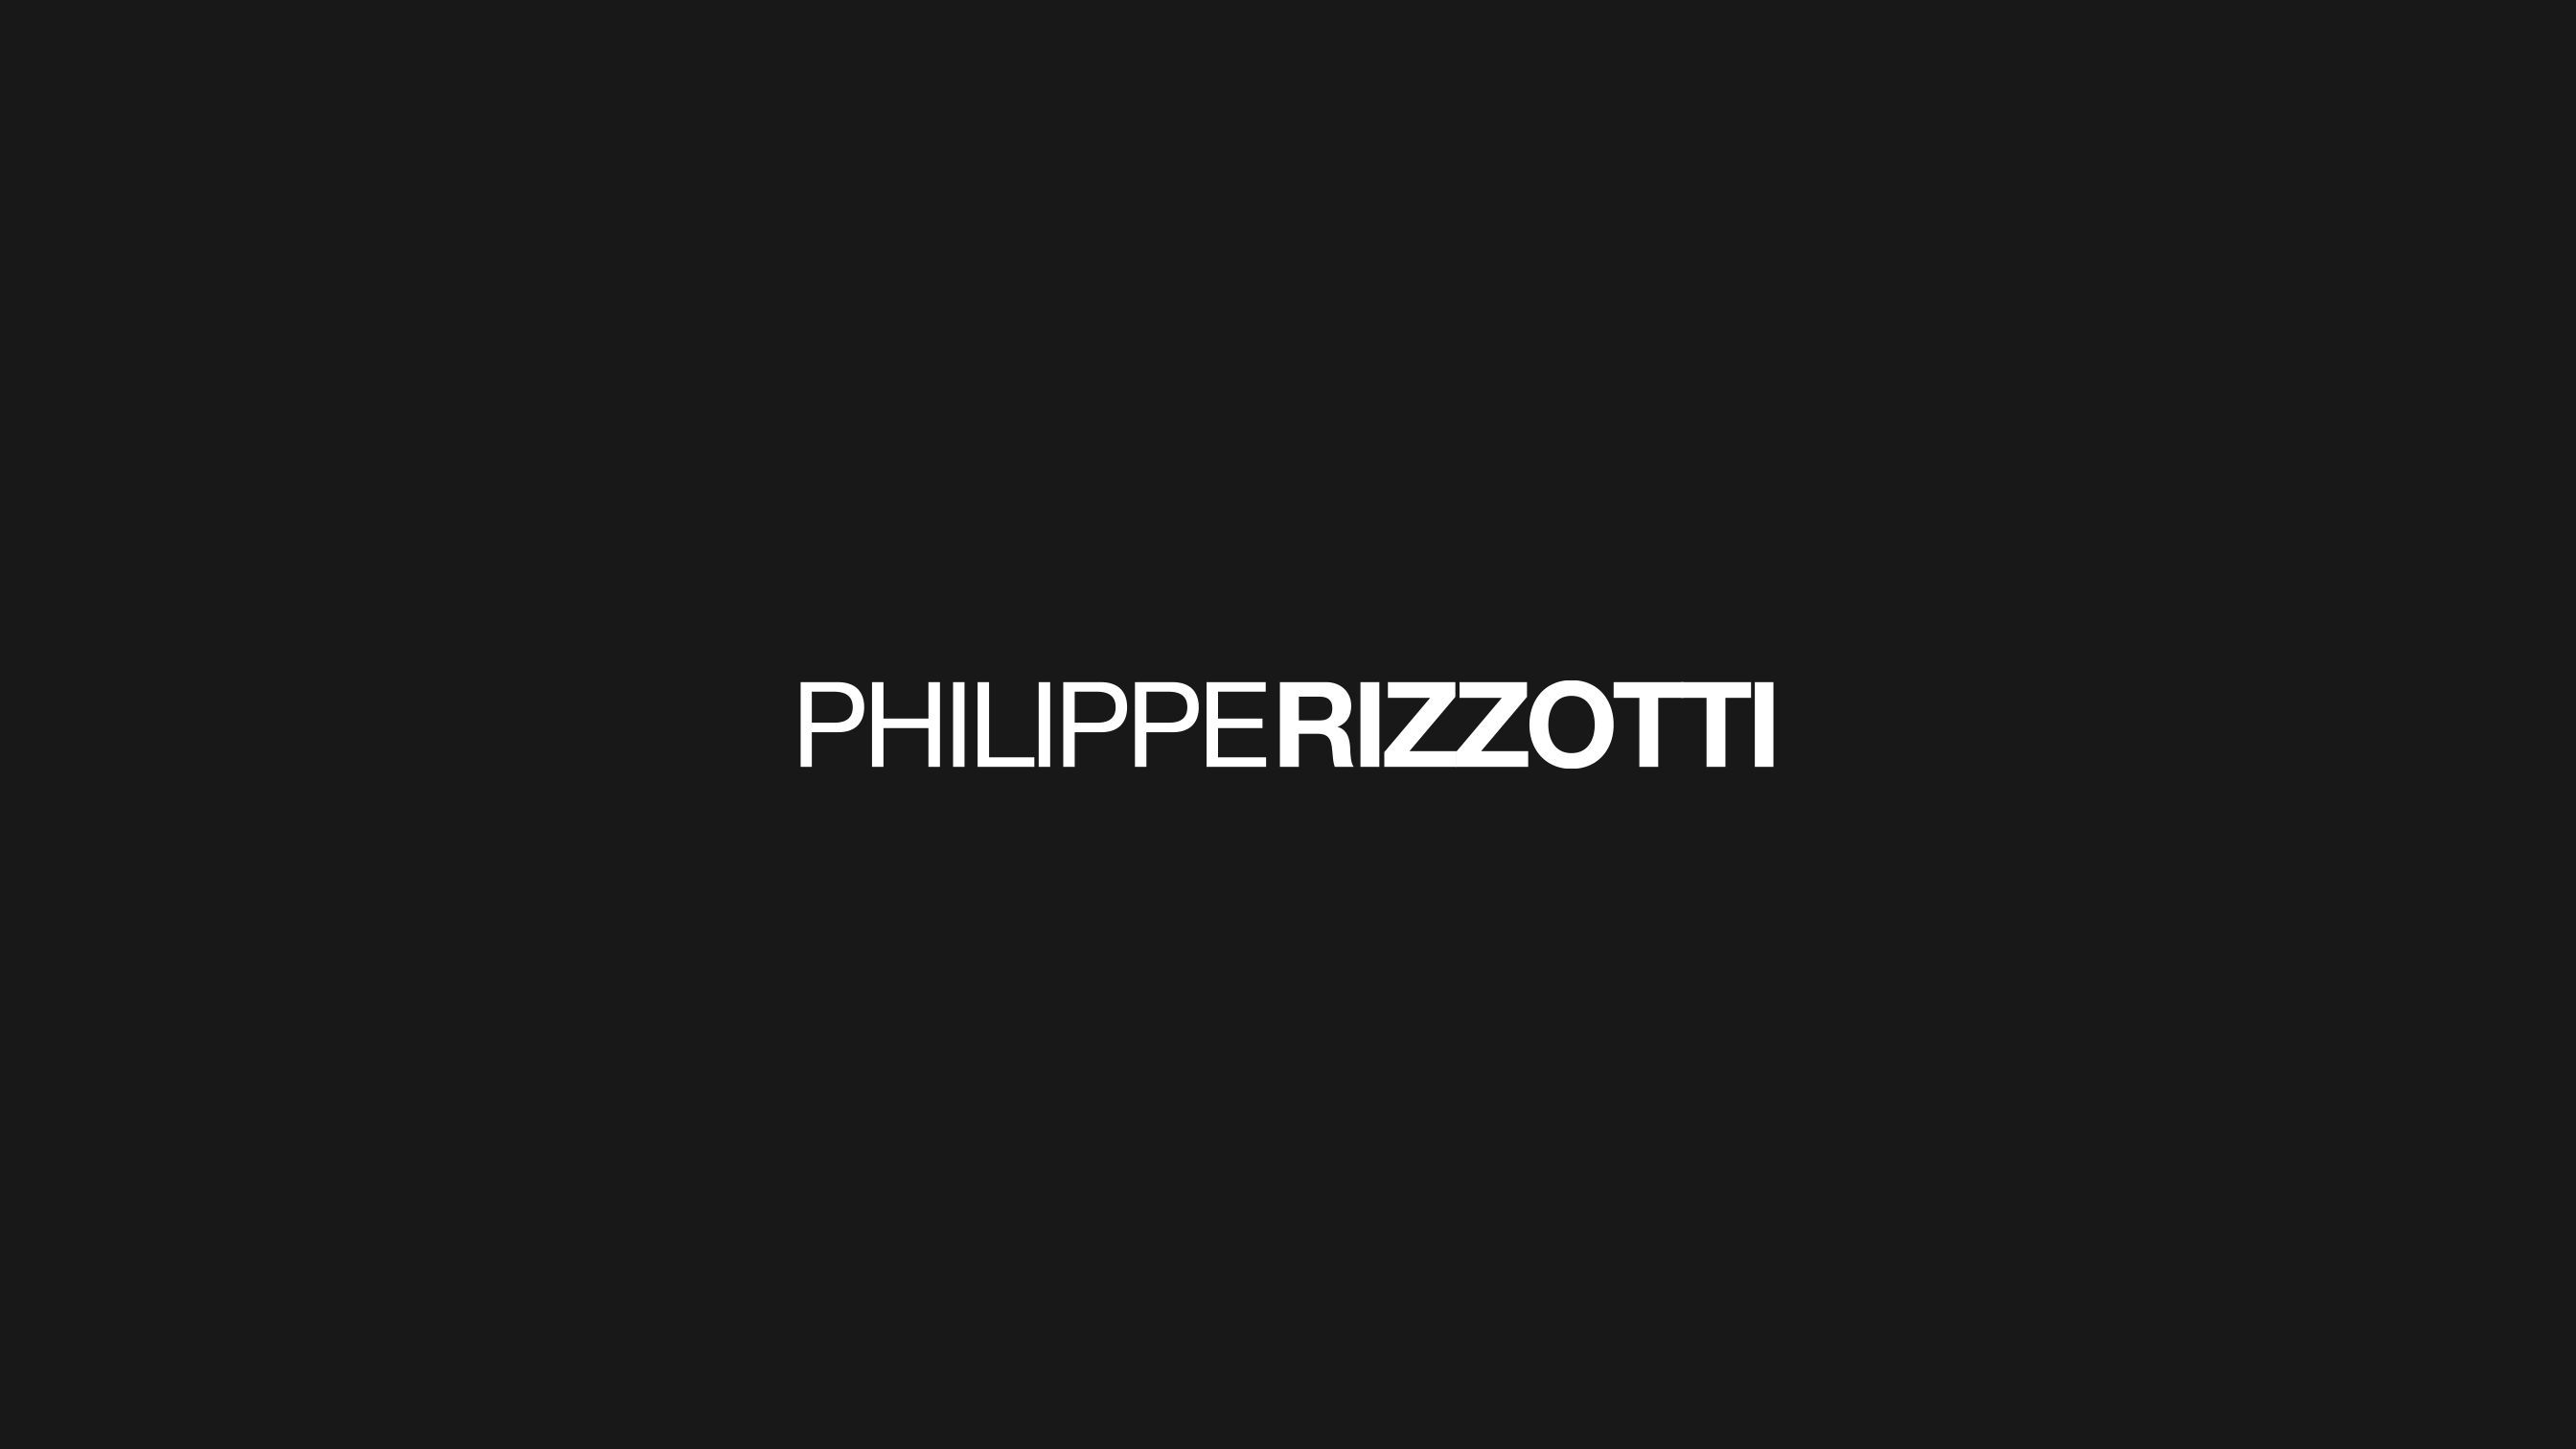 showcase-logotype-rizzotti